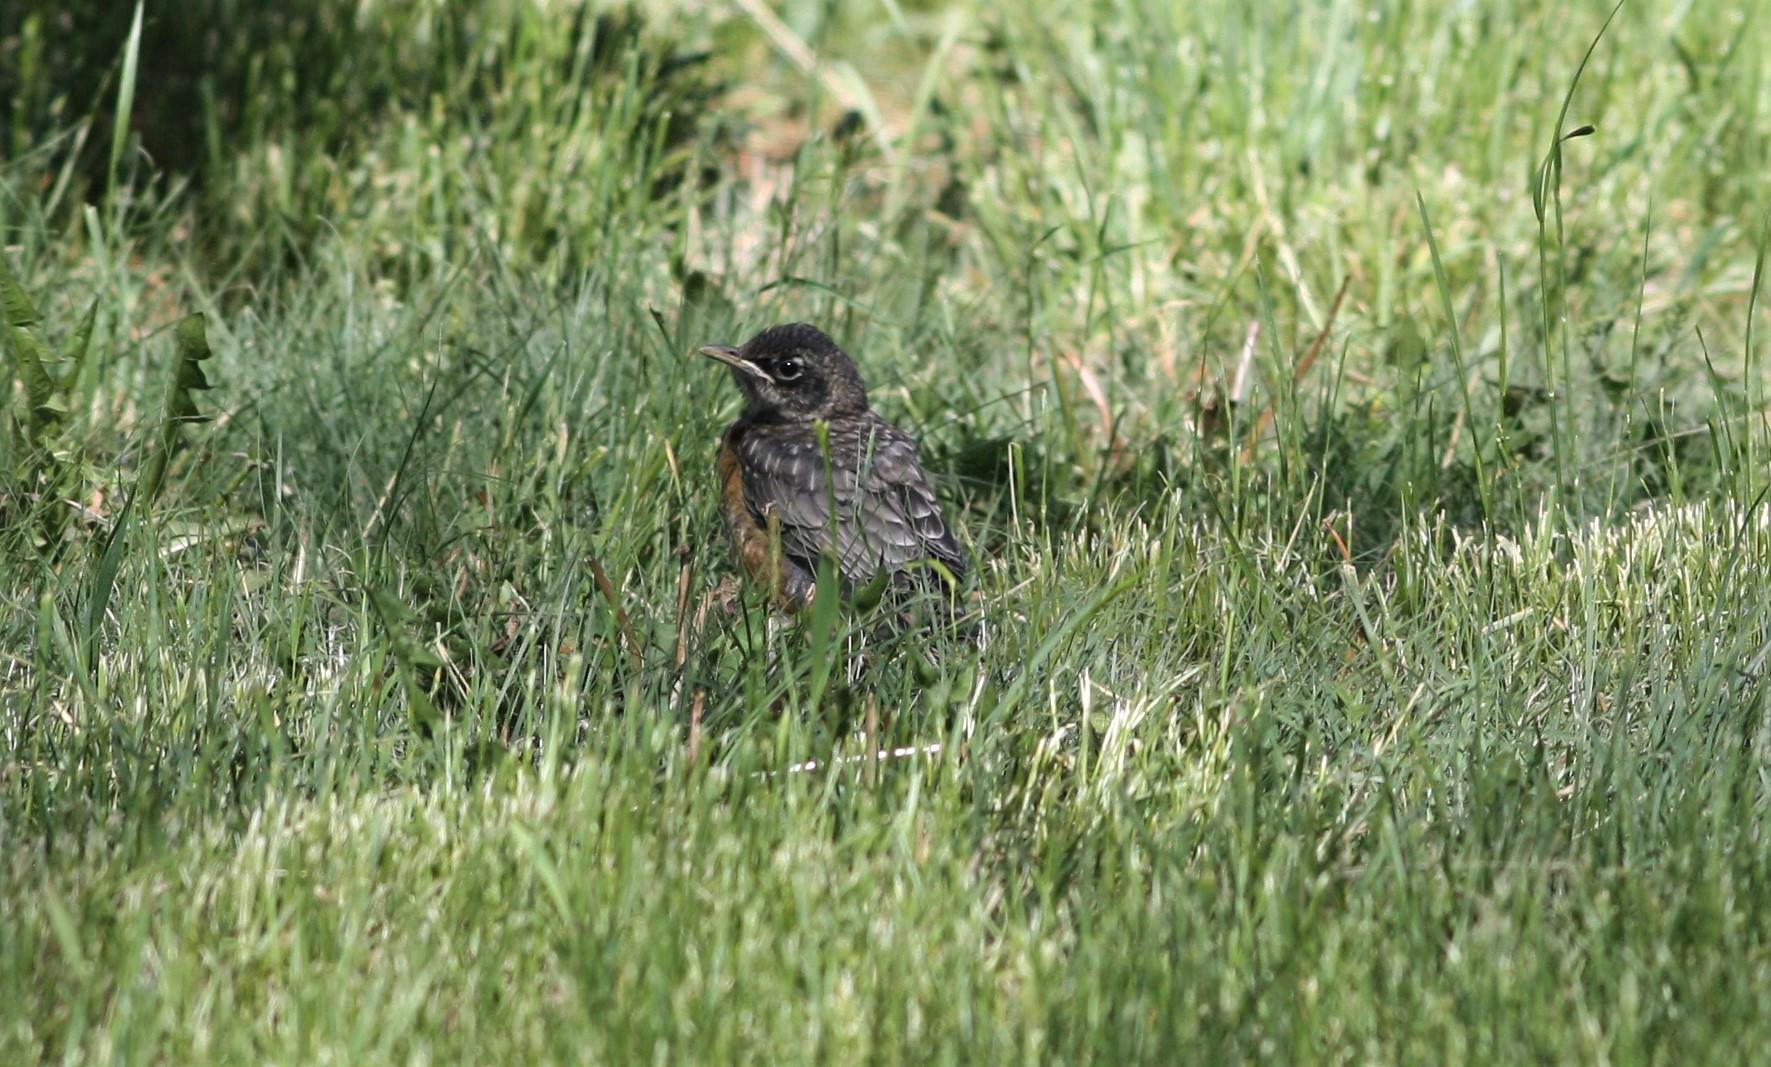 2019-06-12 Juvenile Robin 01